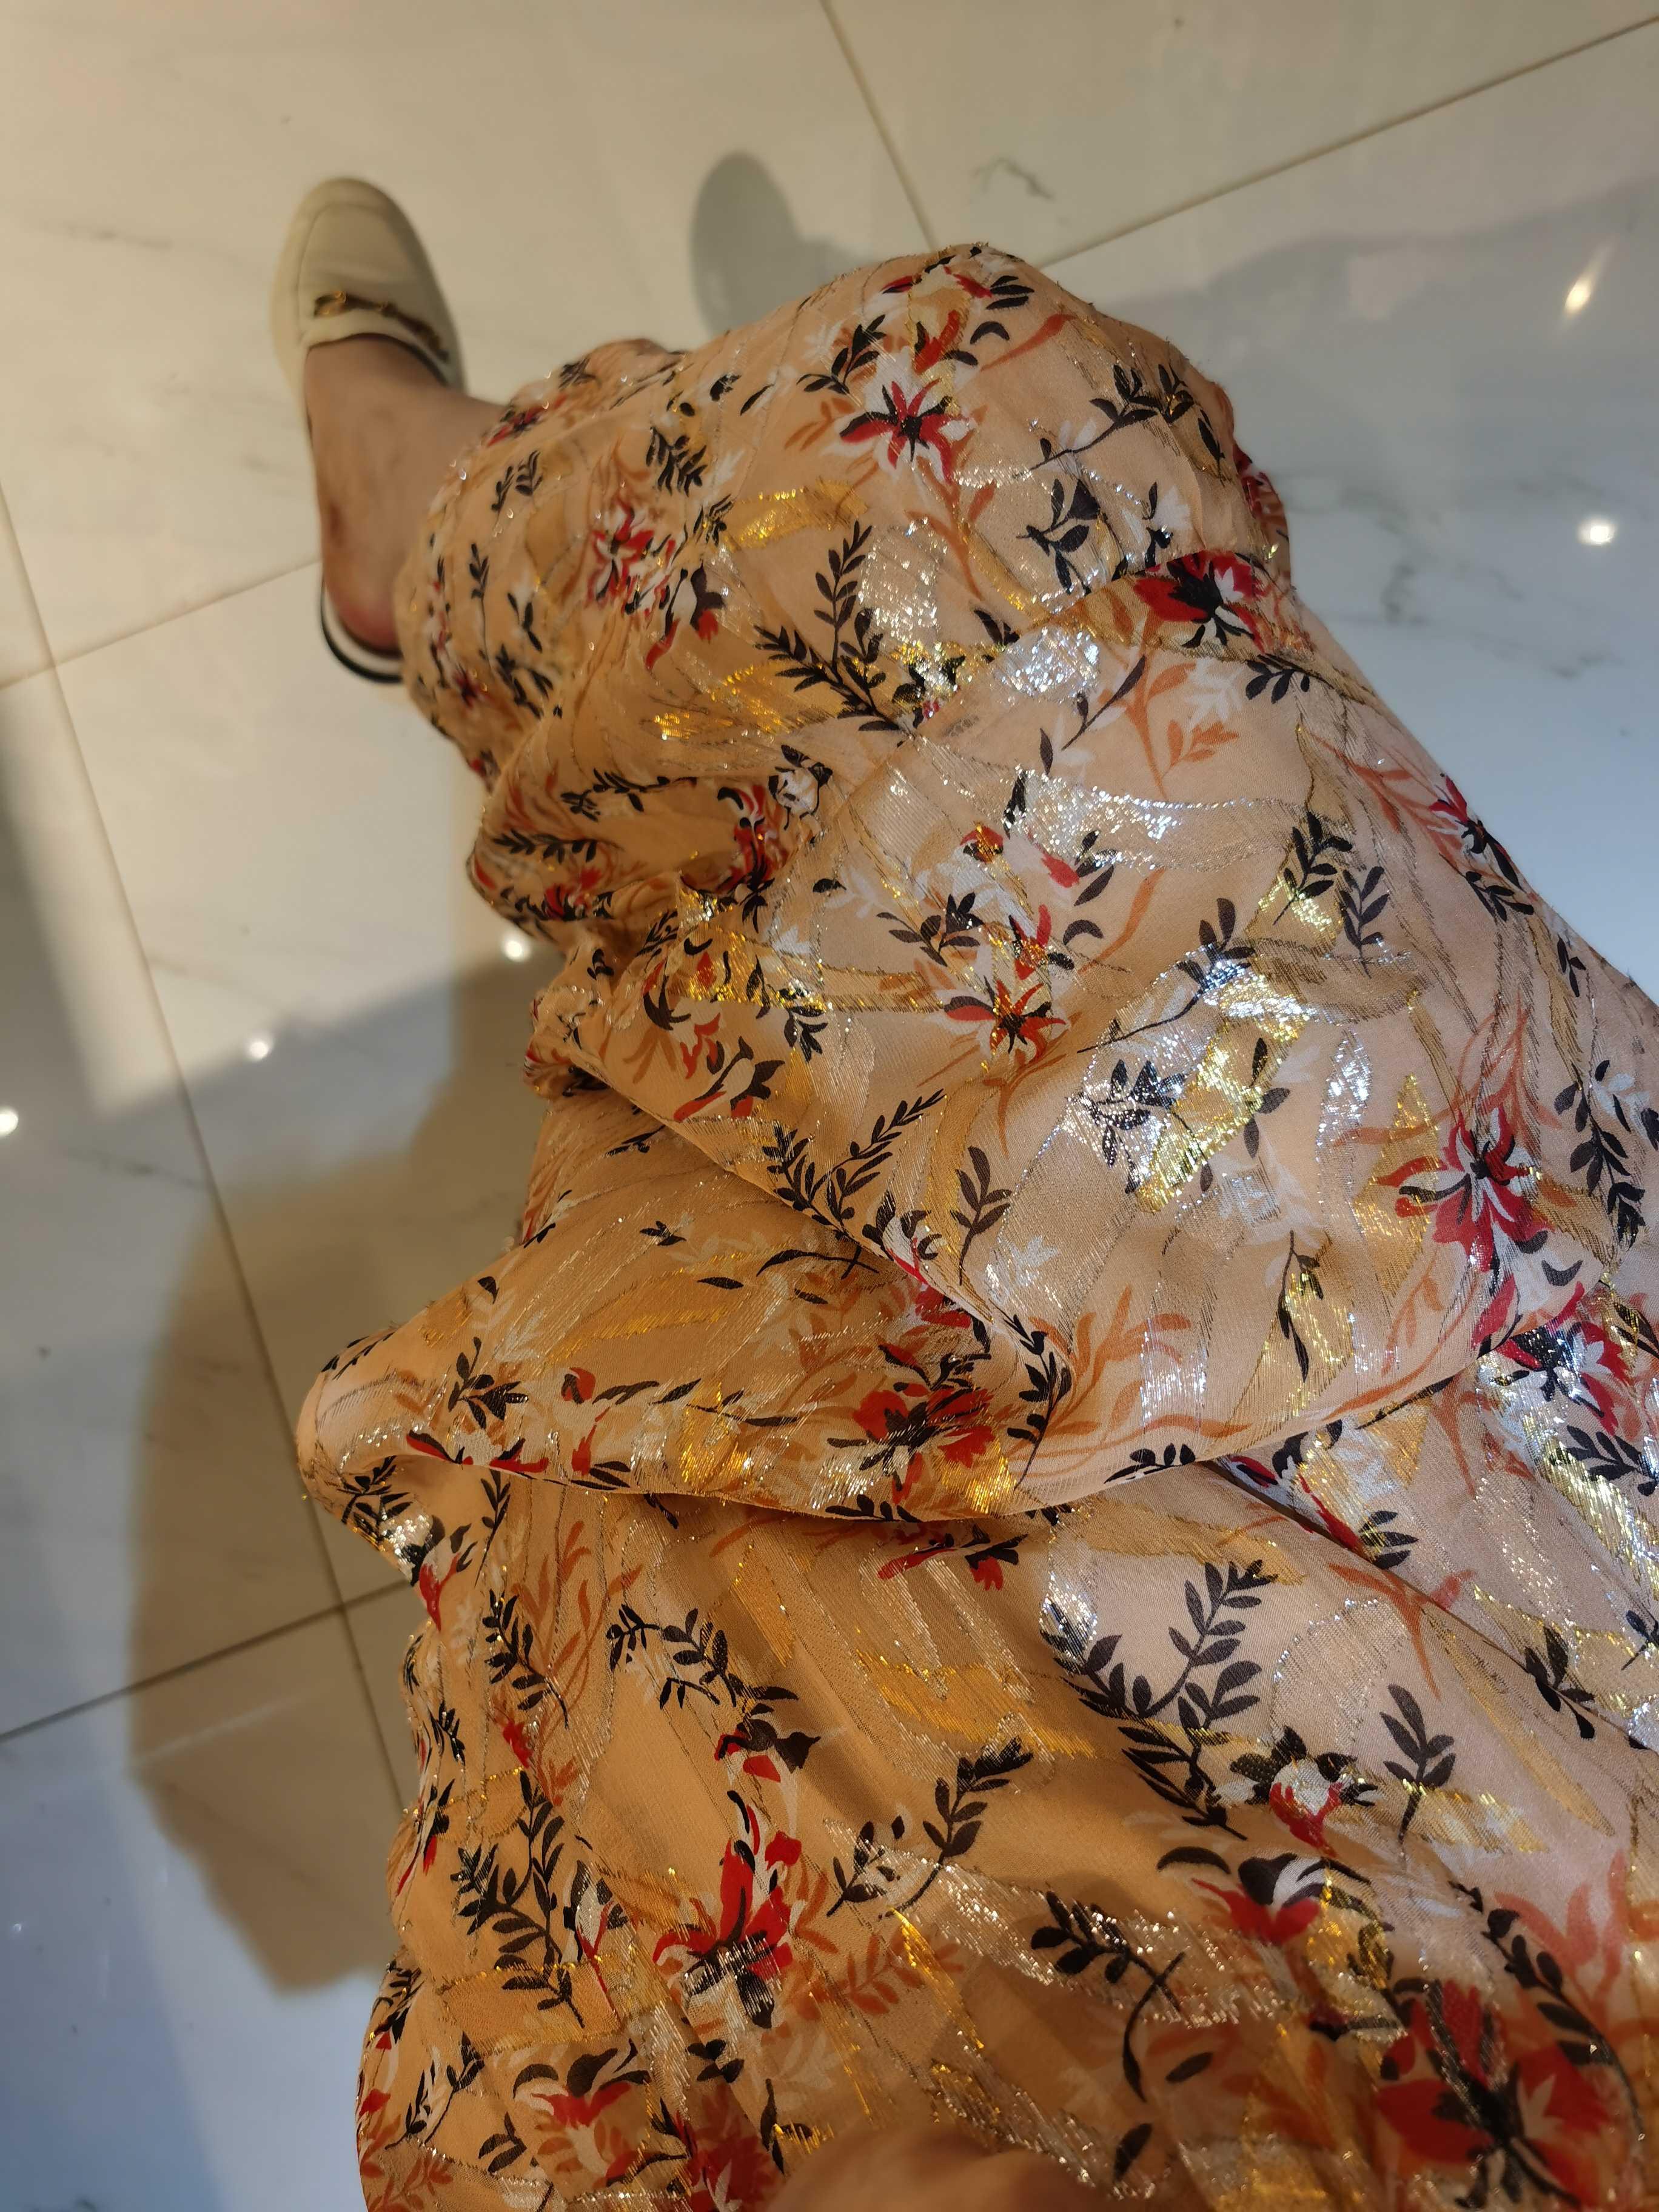 bash2021法系金丝线真丝围裹半裙飘逸长裙 定制产品不退换